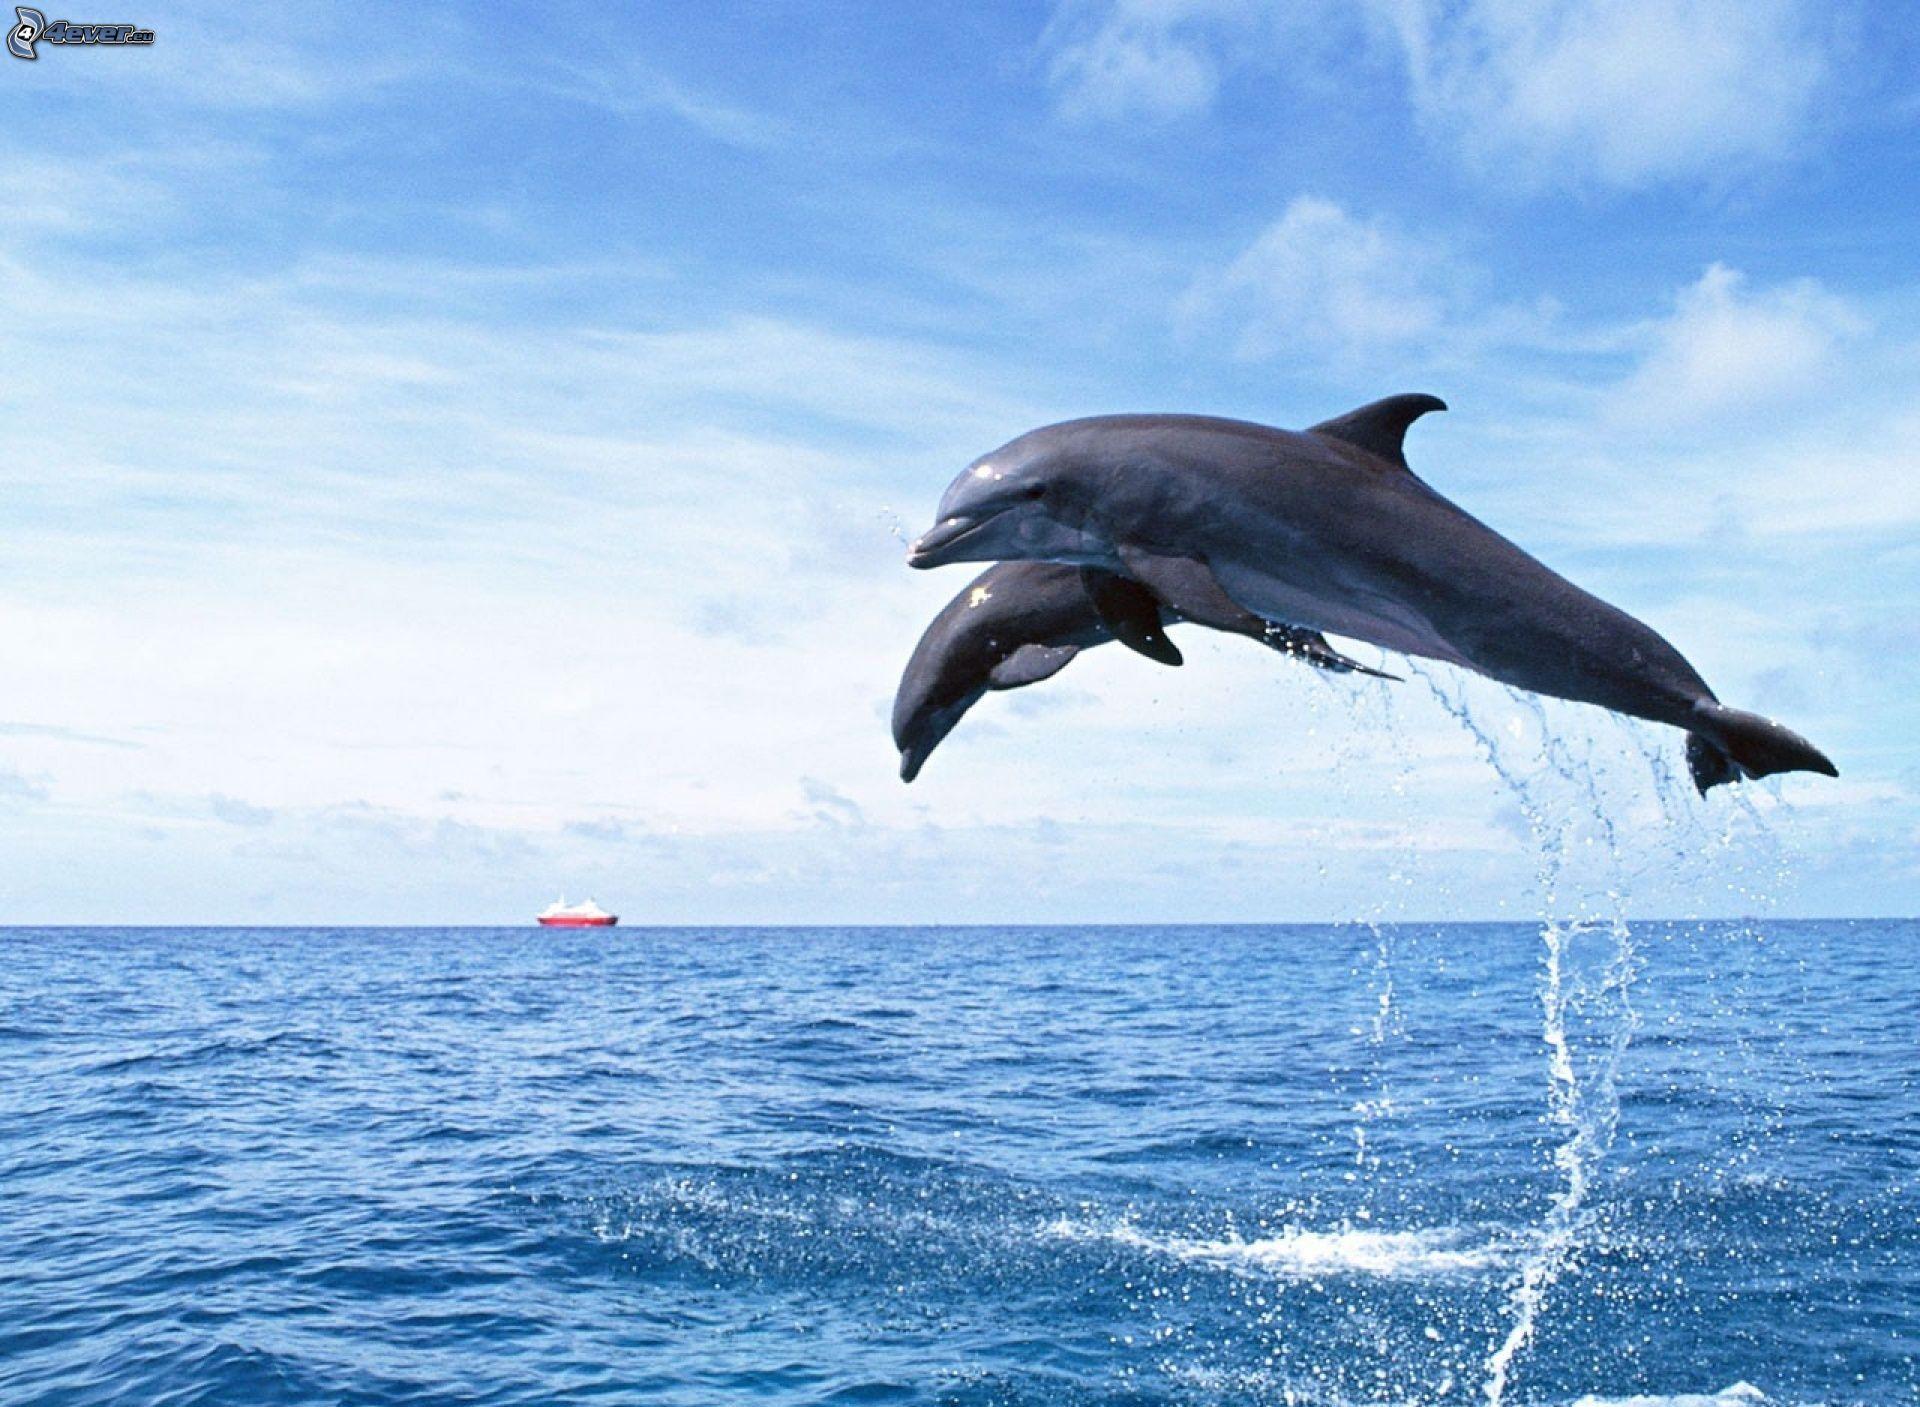 delpine